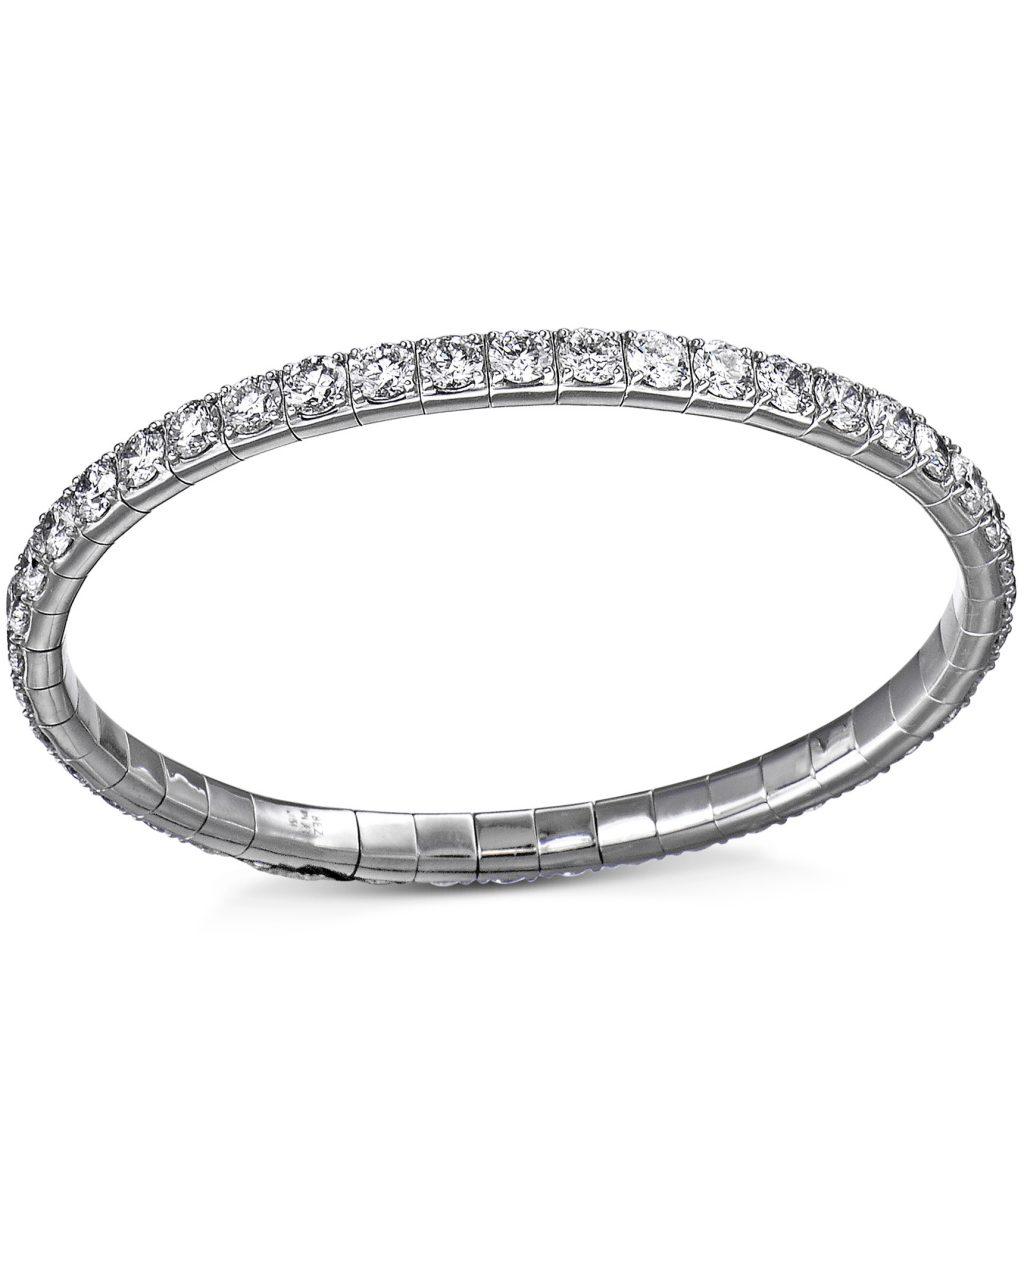 Platinum Diamond Flex Bracelet by Bez Ambar